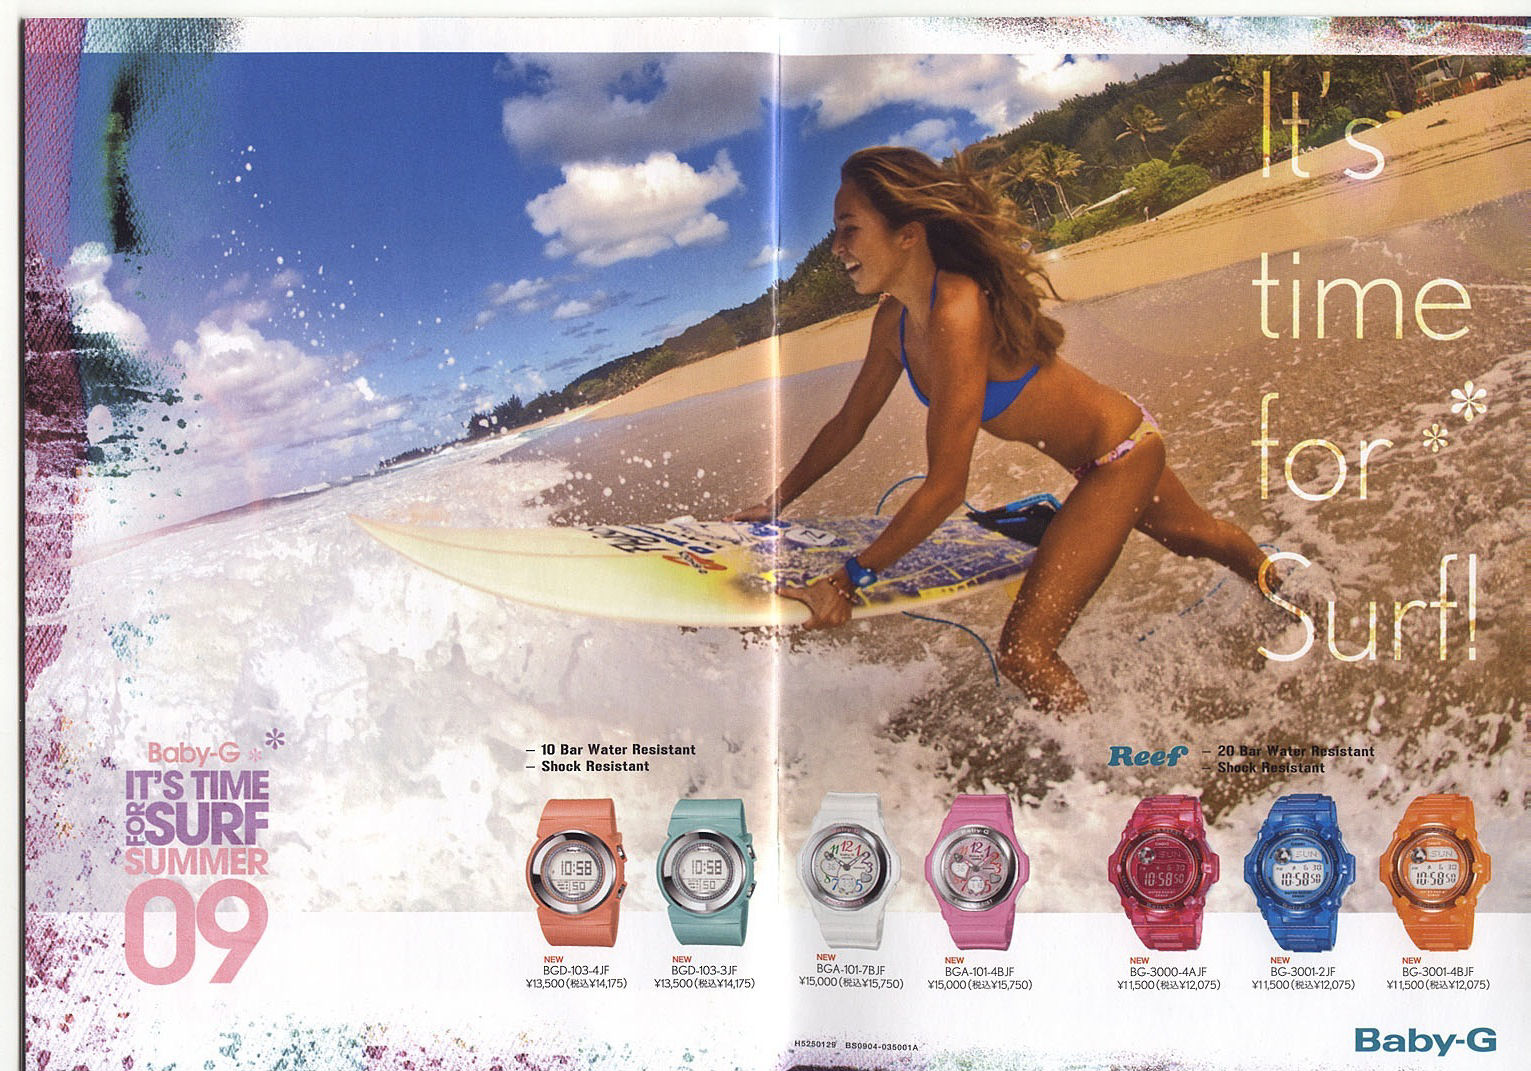 Casio-G-Shock-Surf-Collection-Summer-2009-Page-8.jpg